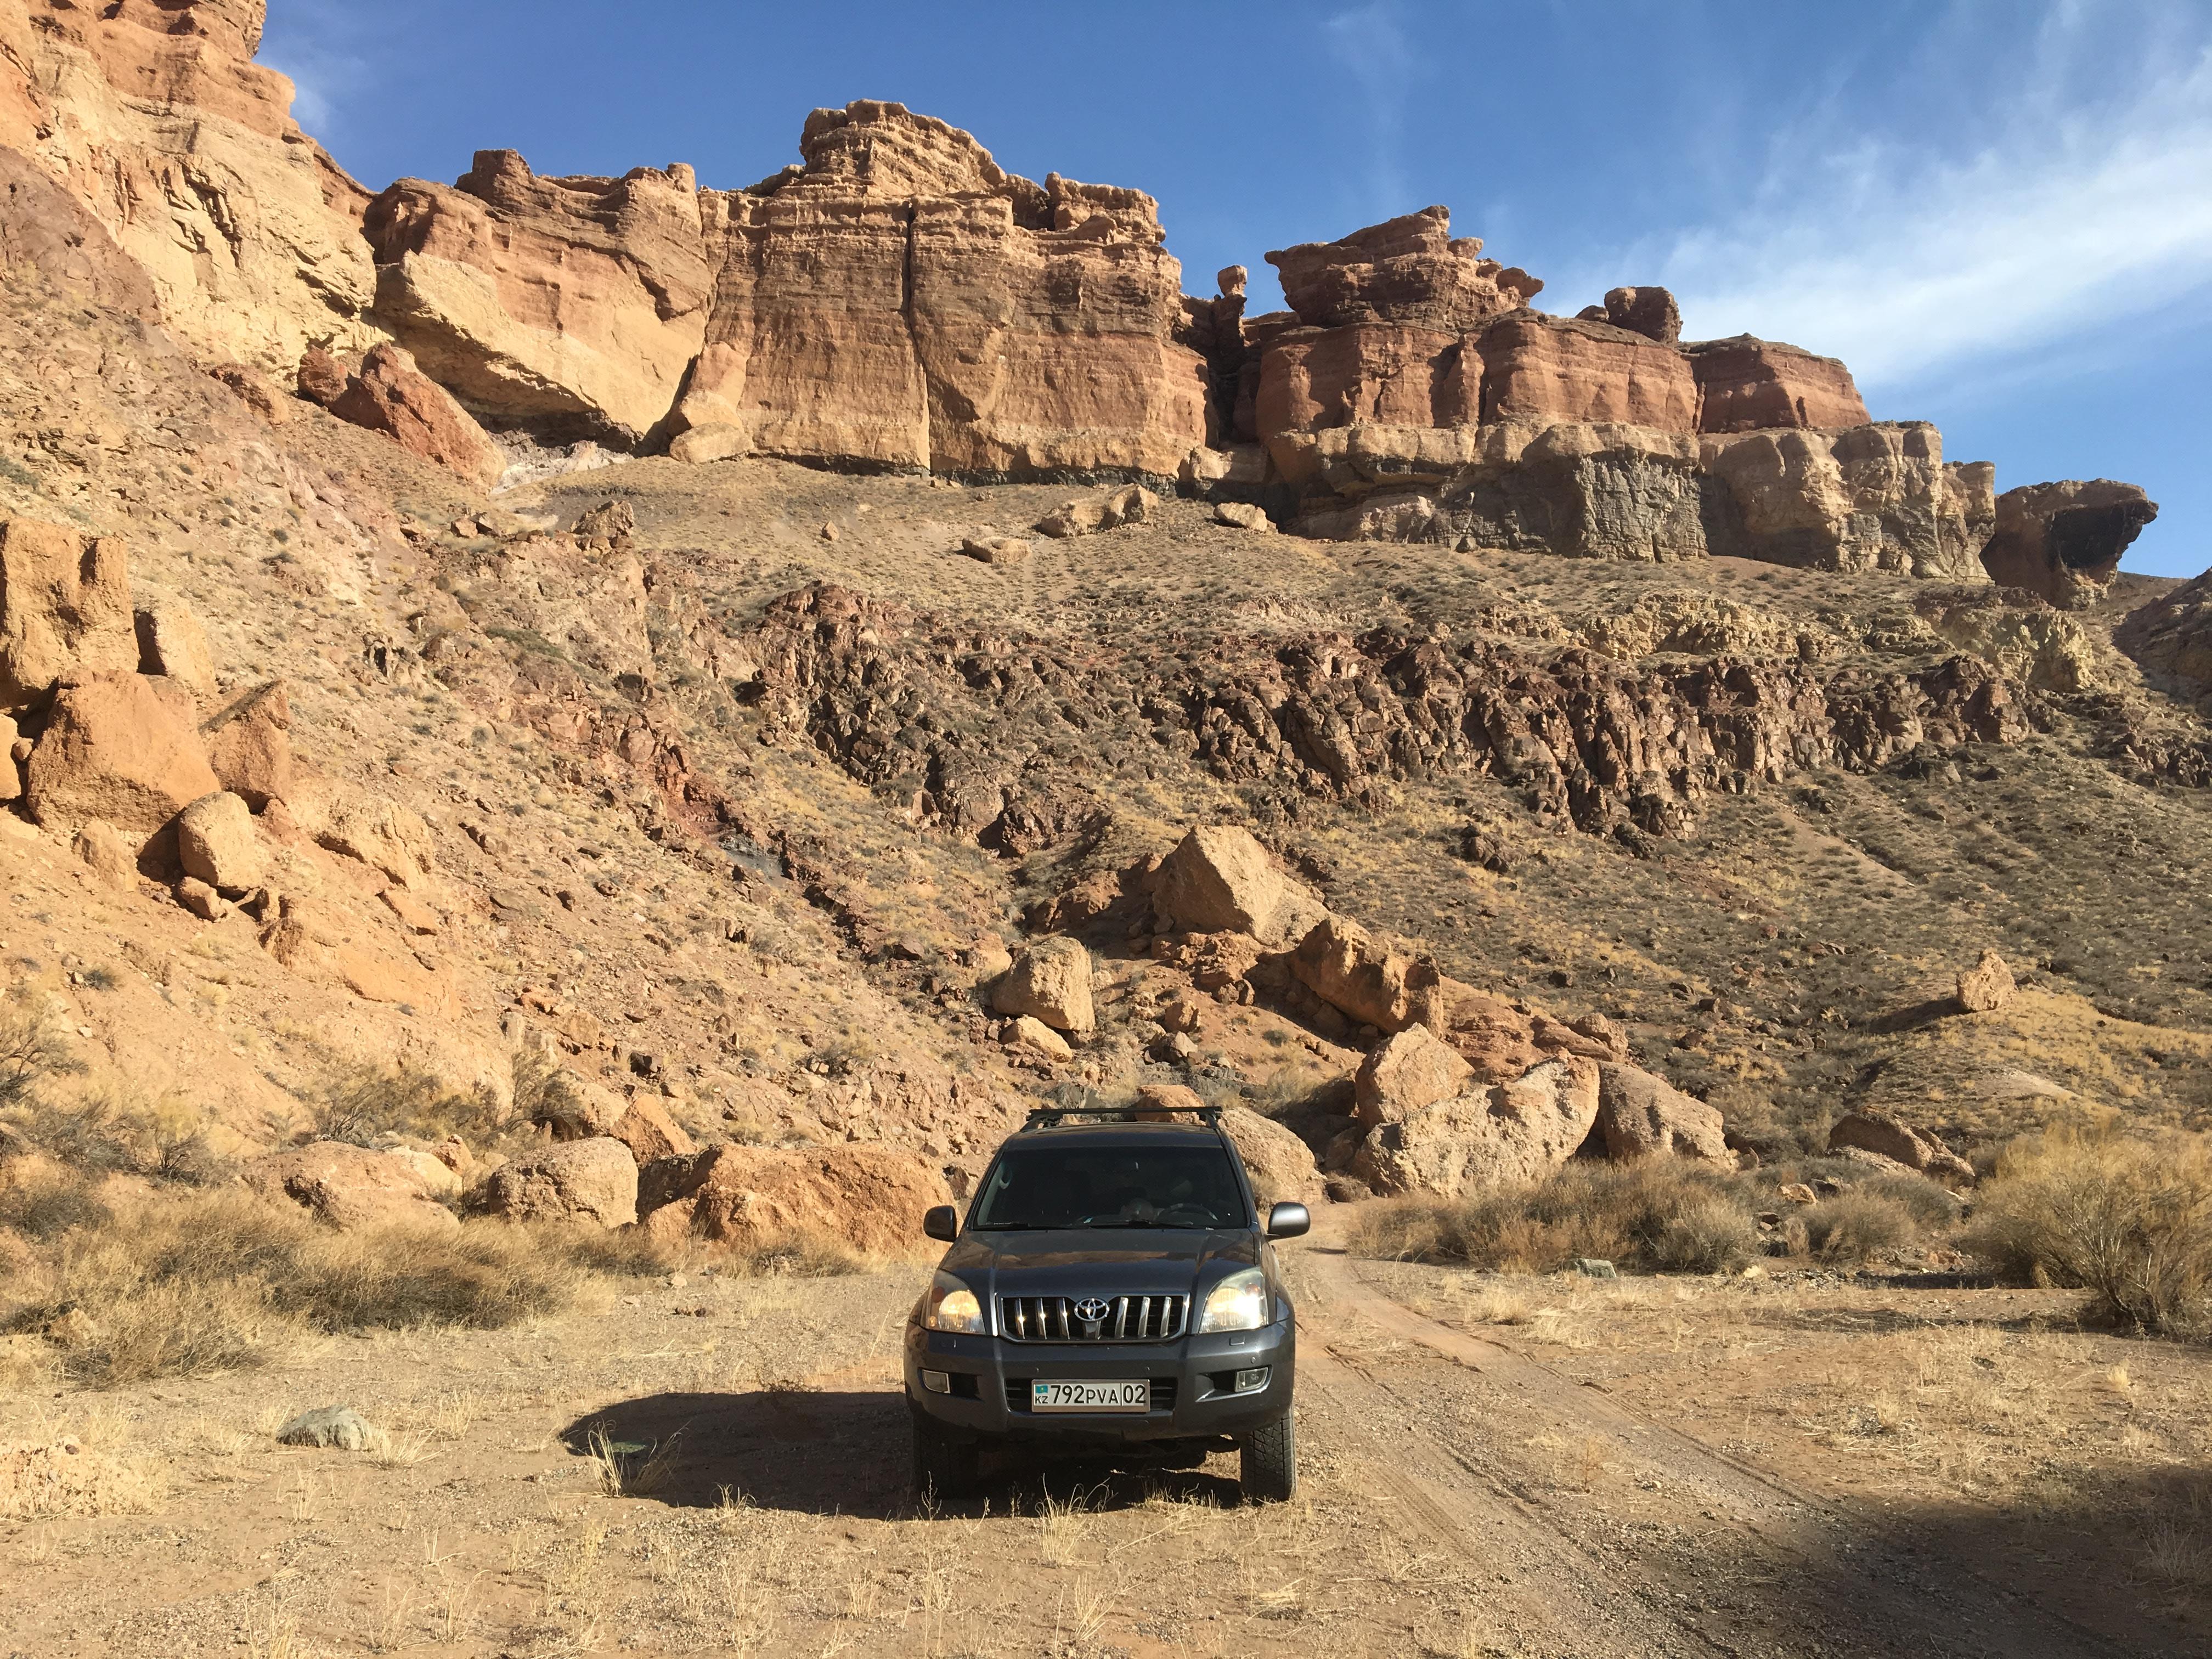 Riding across the canyon